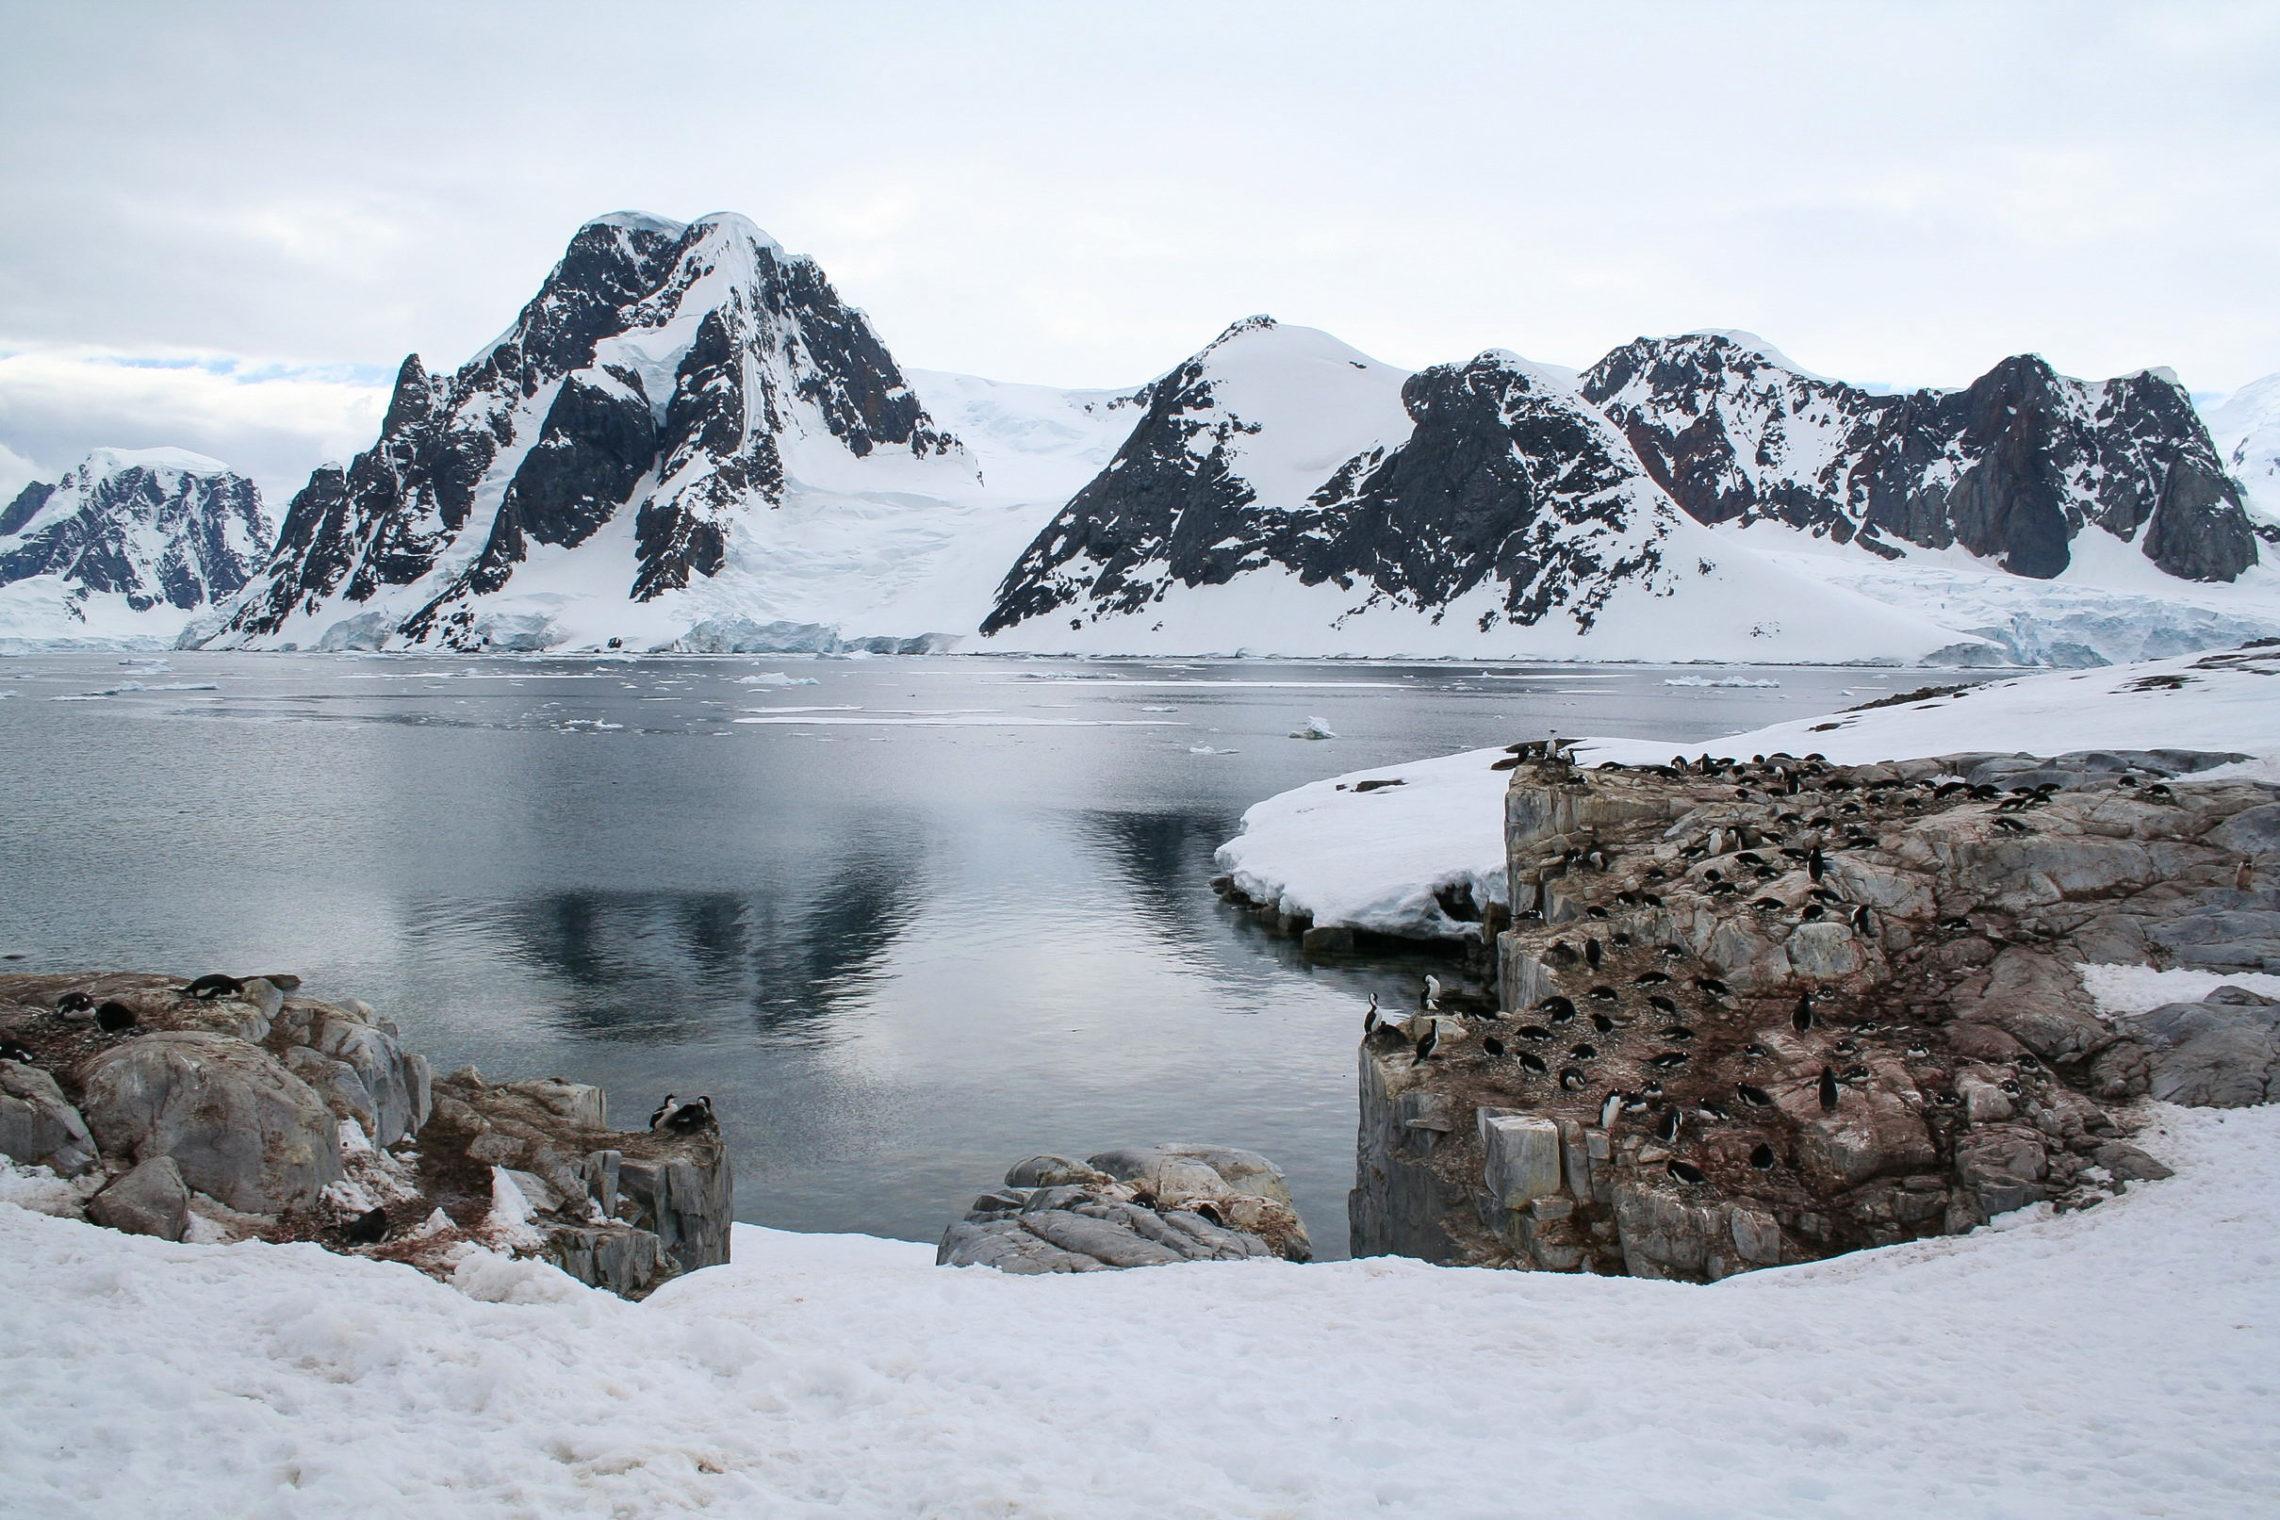 Isole Falkland Georgia del Sud e Penisola Antartica  Tour 2000 America Latina